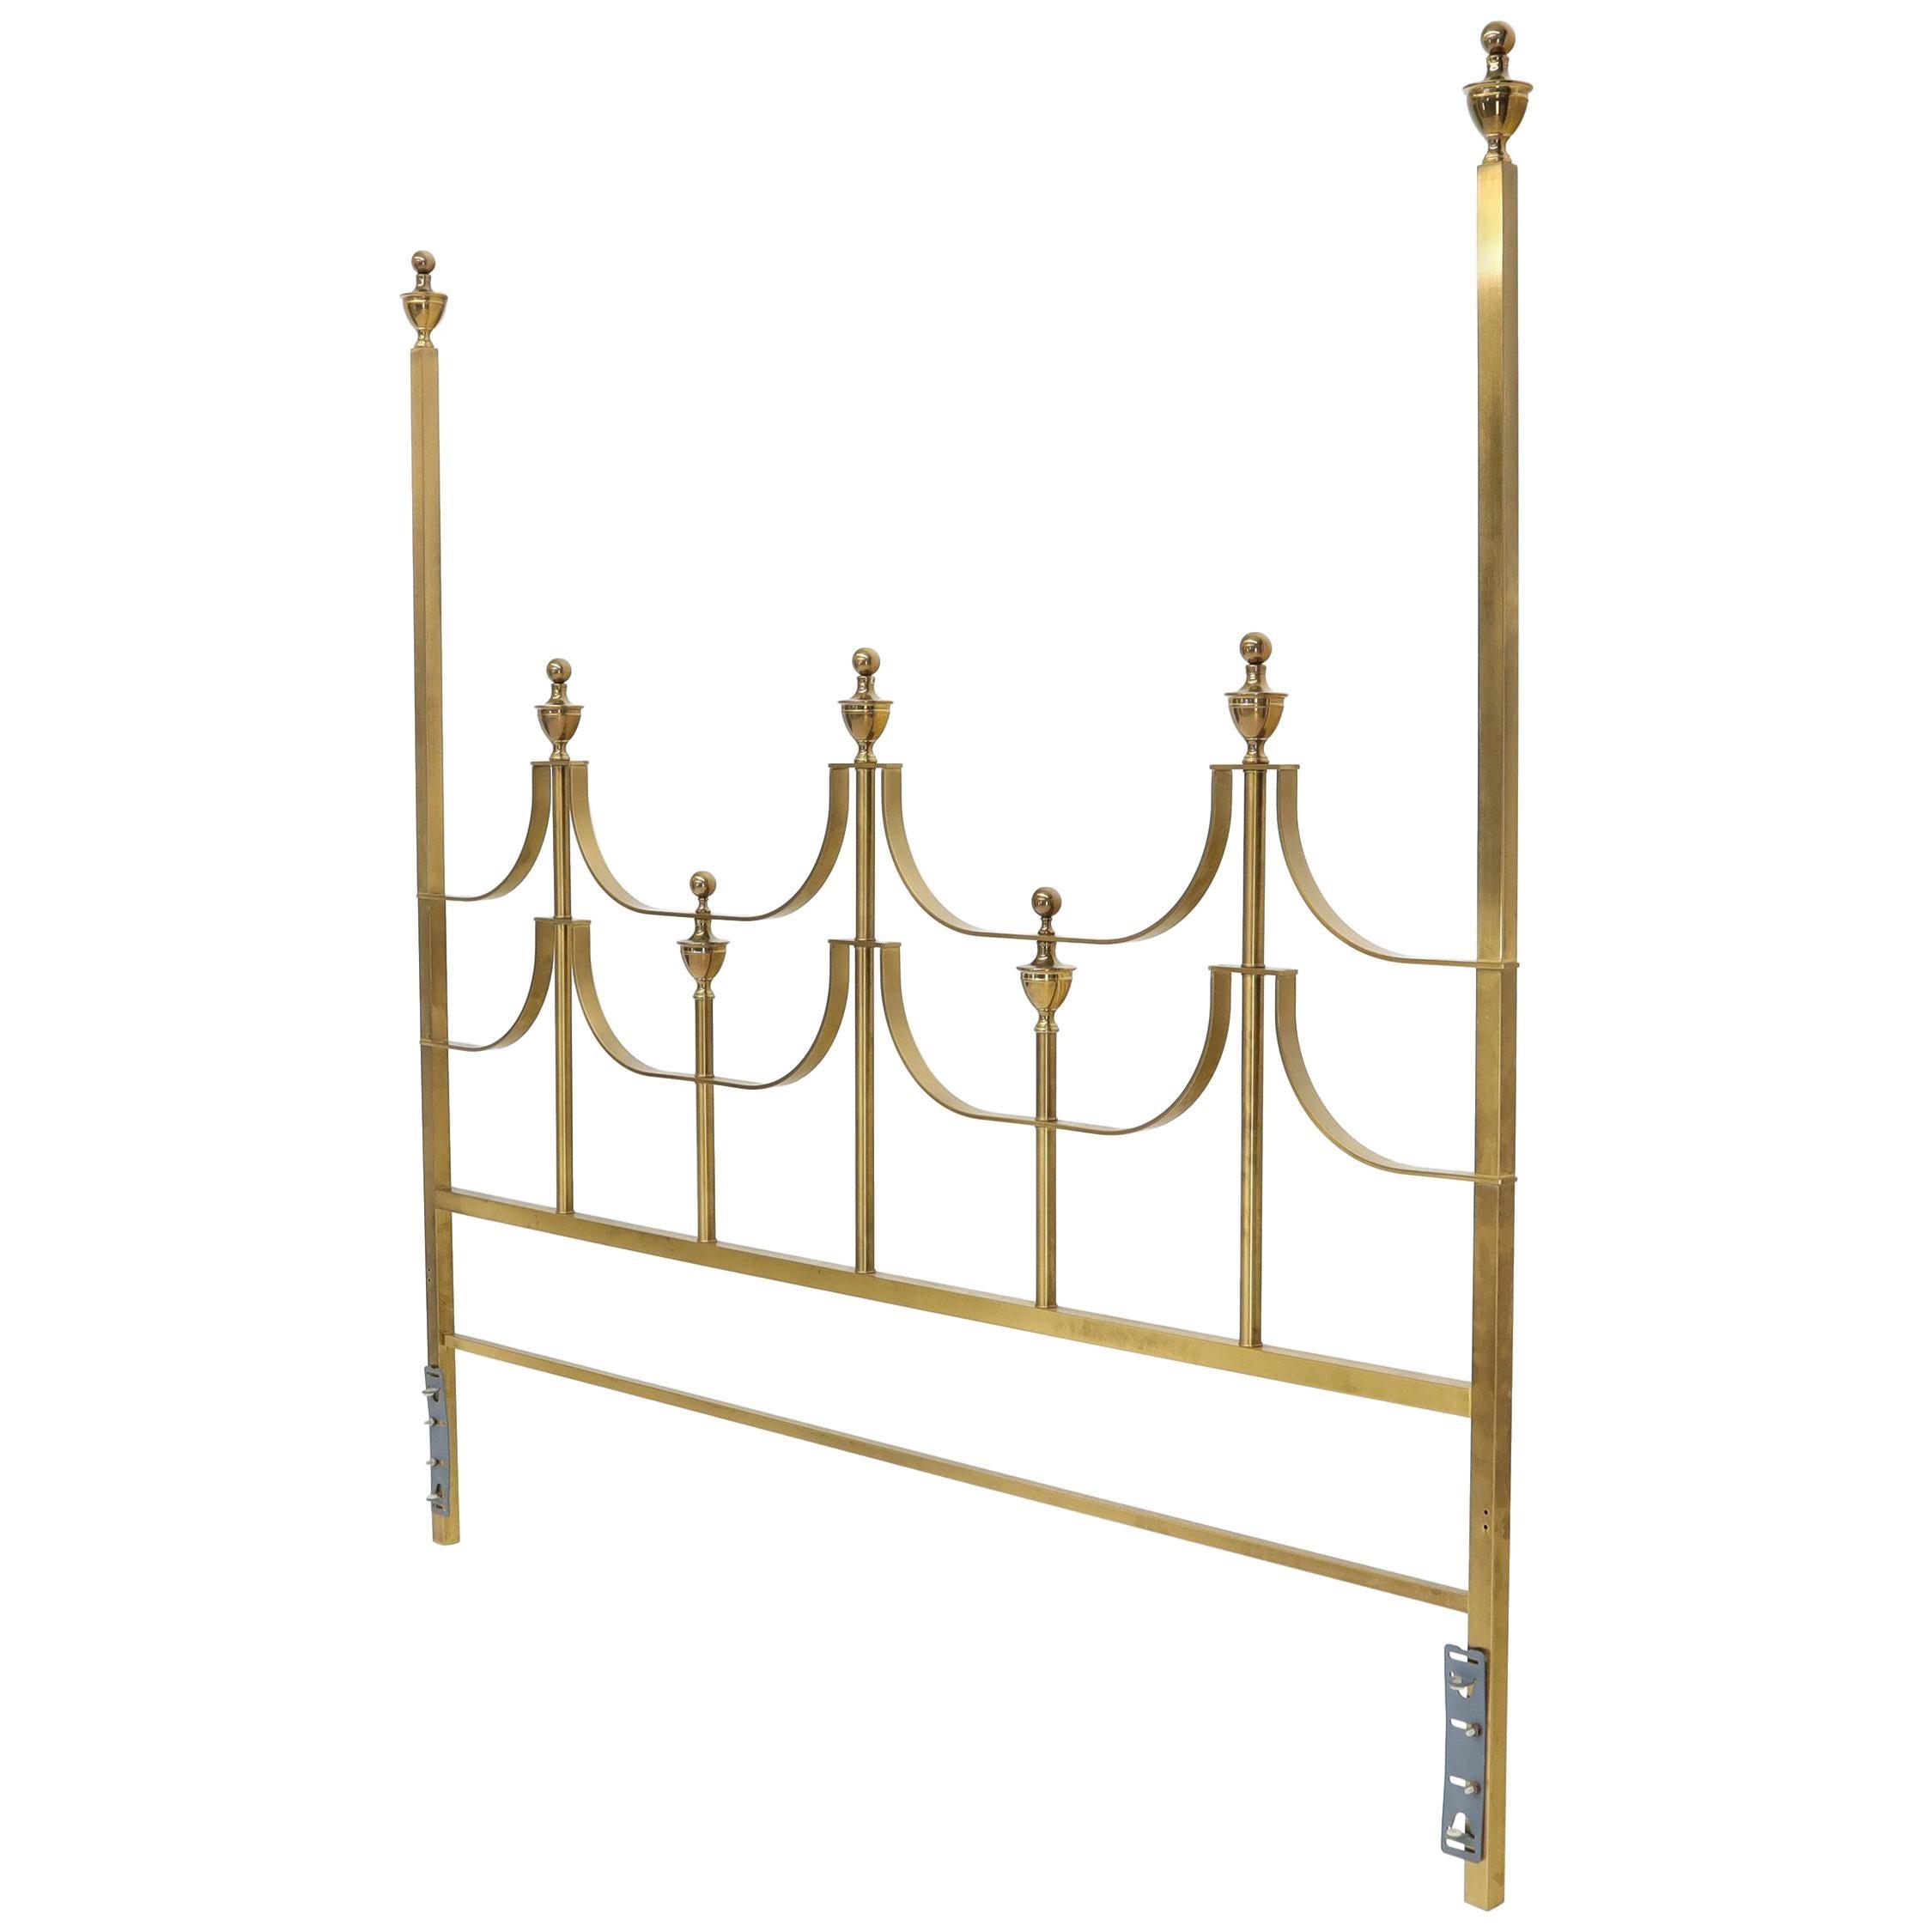 Solid Brass Mastercraft King Size Tall Headboard Bed